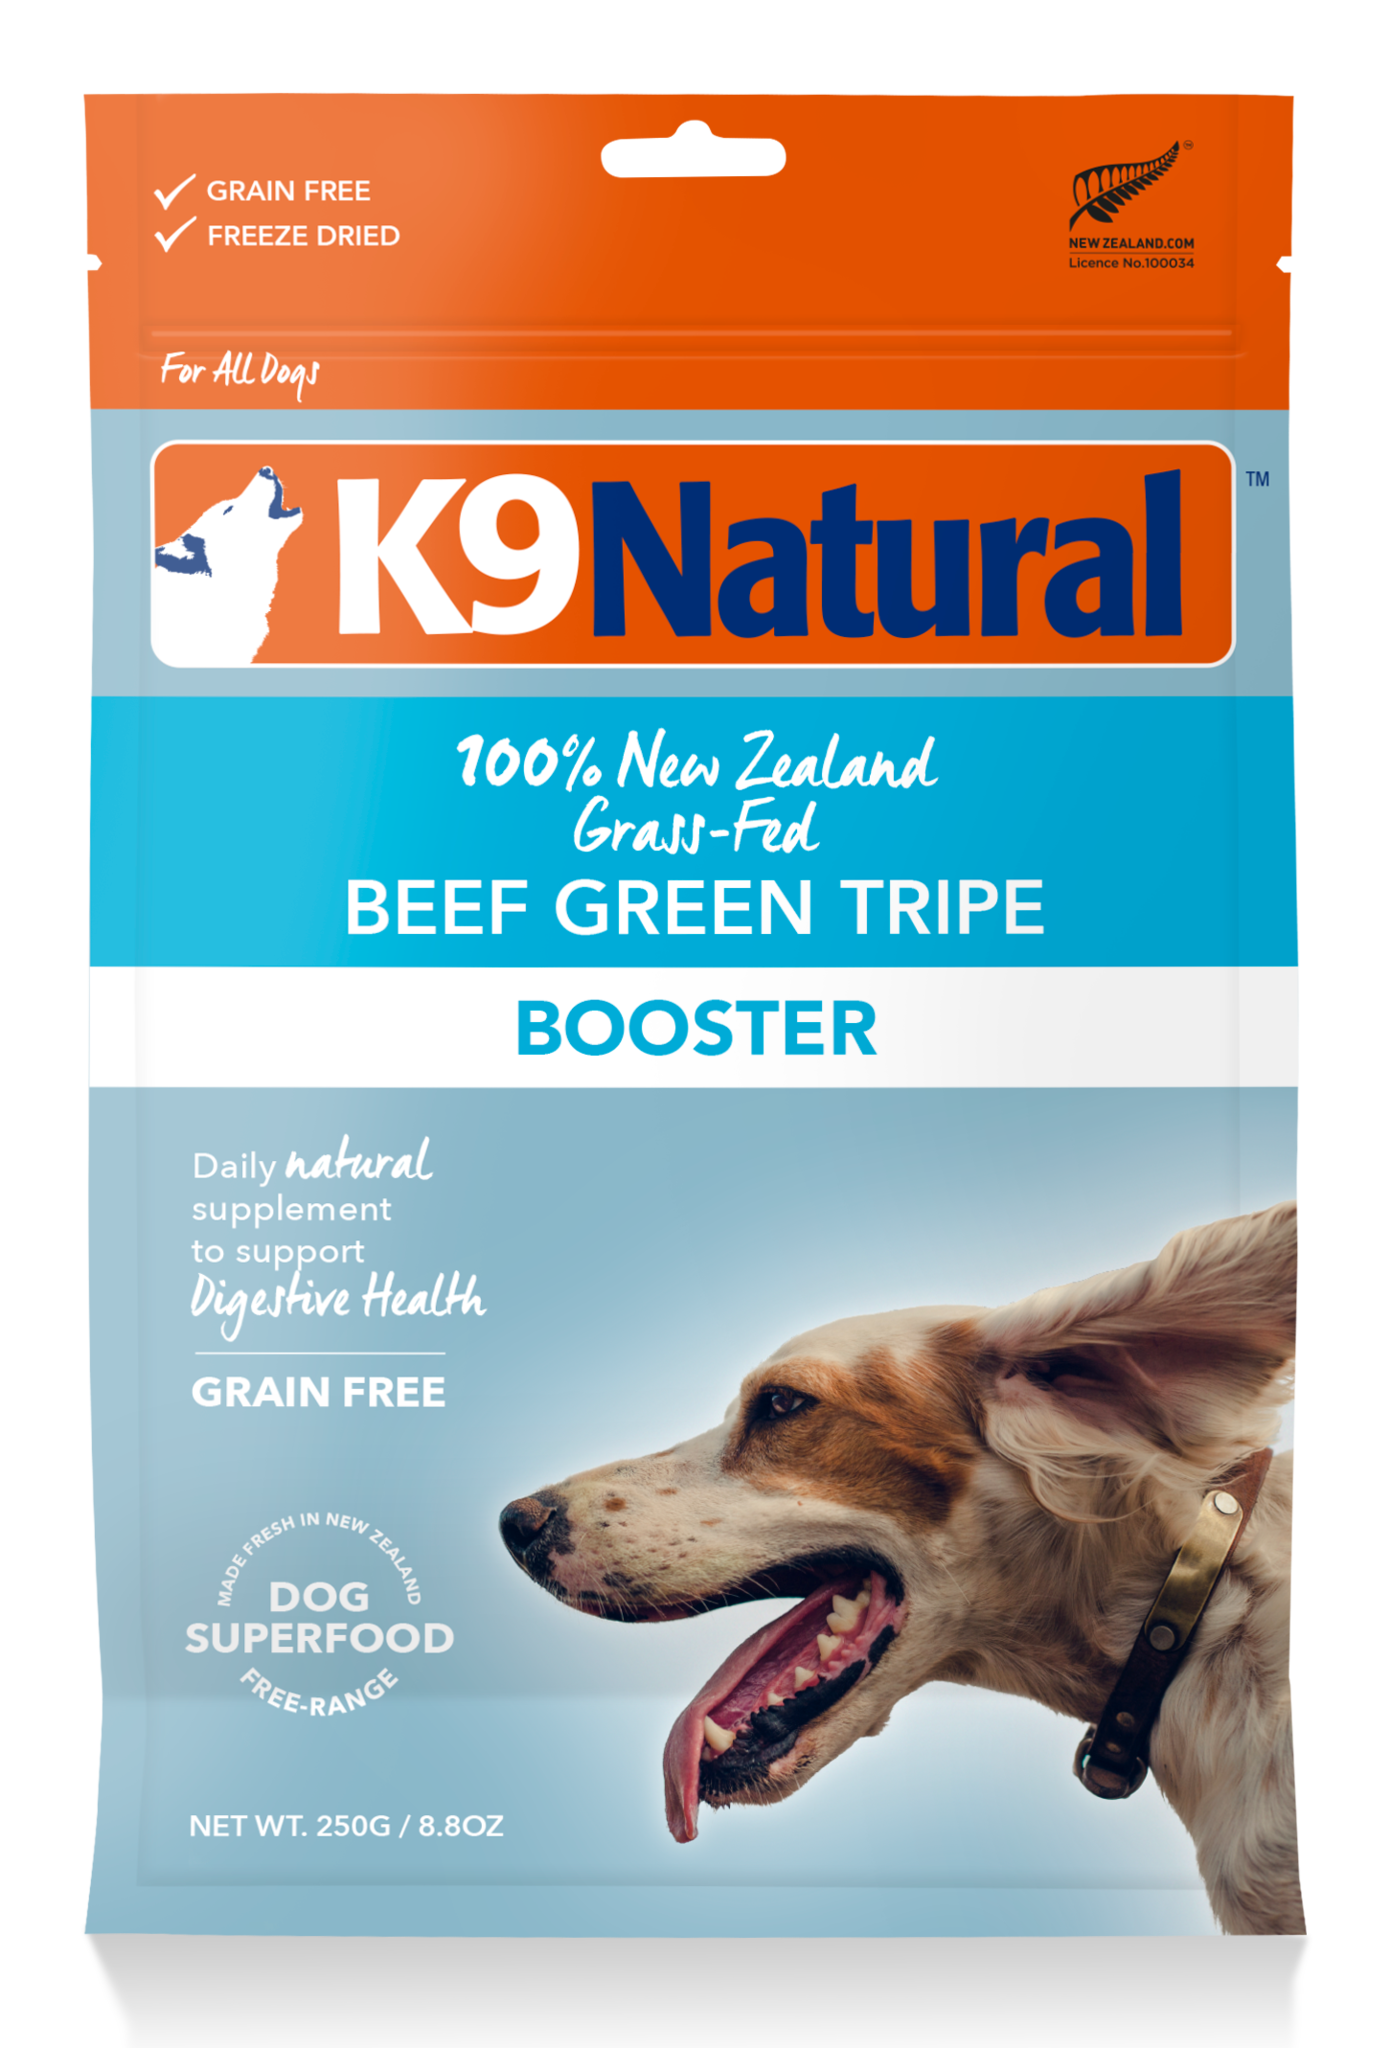 K9 Natural K9 Natural Freeze Dried Beef Green Tripe Dog Food Booster